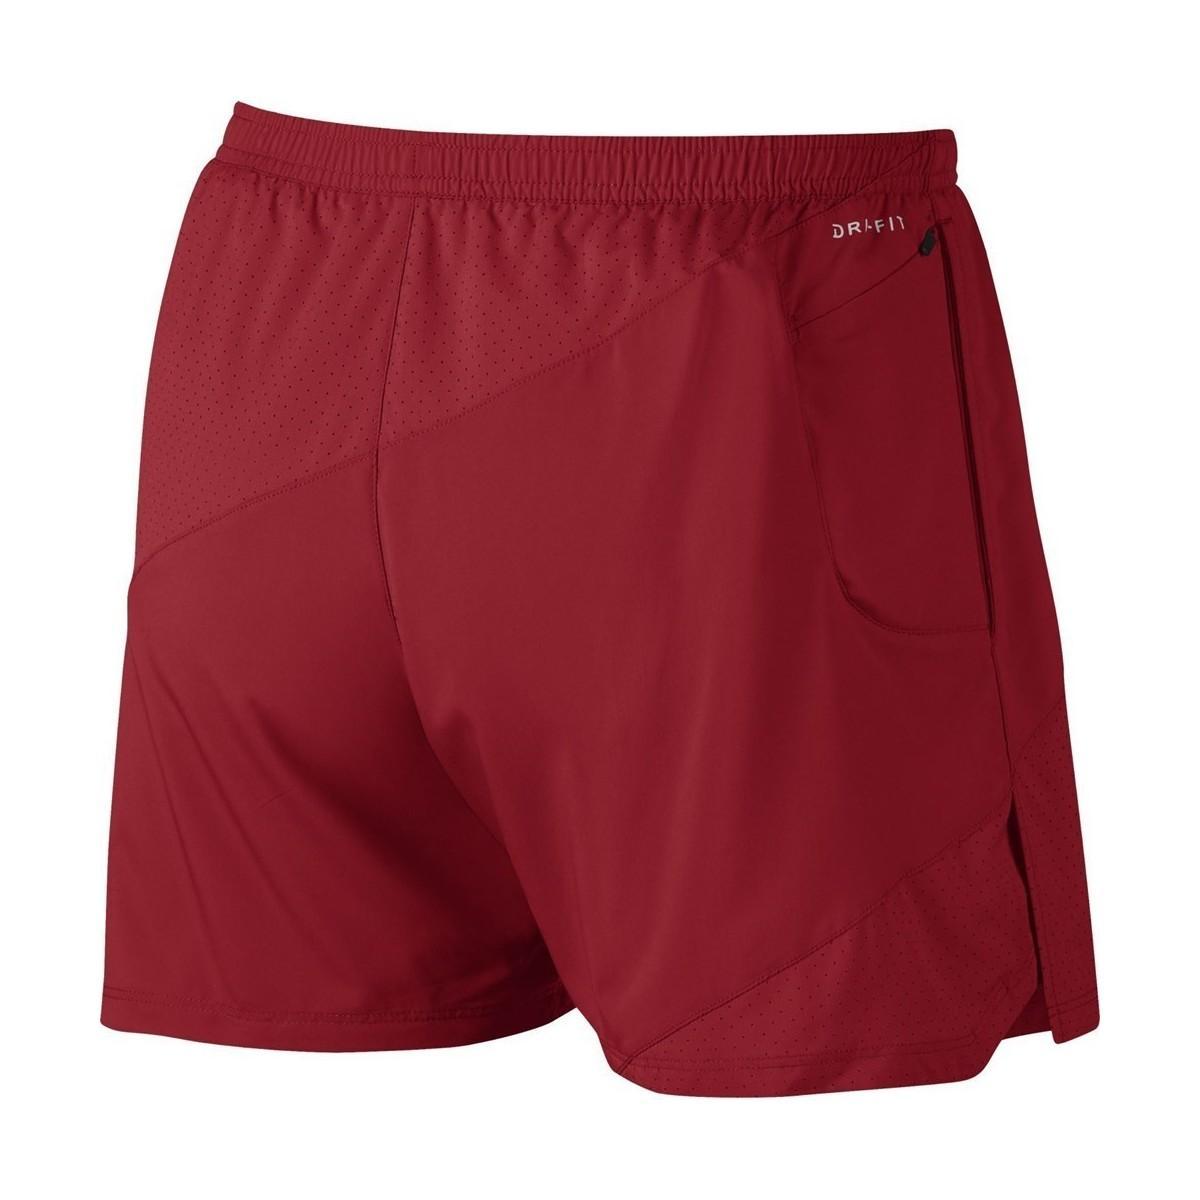 5ad032e73eeee Nike Flex 834188 602 Men s Shorts In Multicolour in Red for Men - Lyst